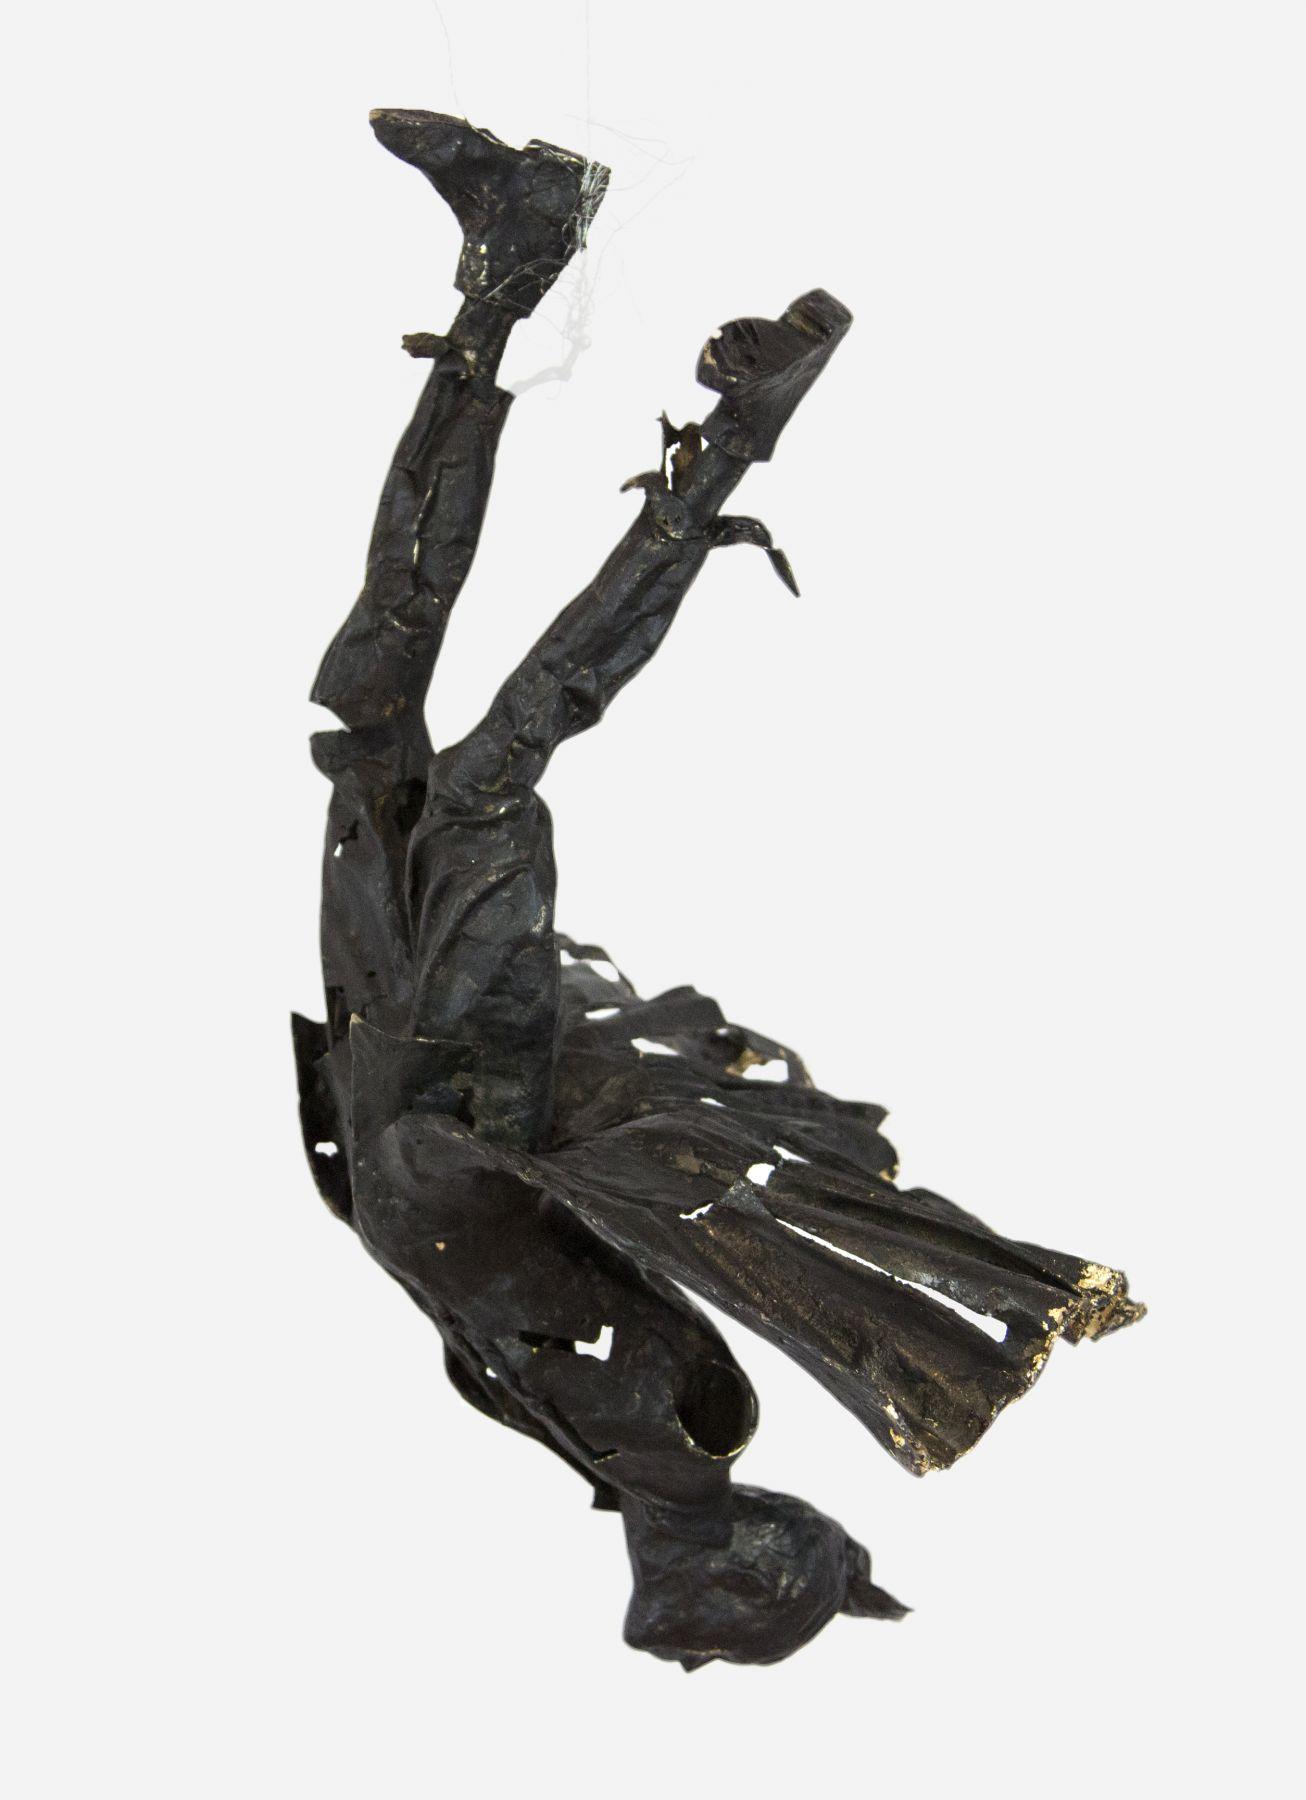 Lesley Dill, Thrill, 2009, unique cast bronze, 17 x 15 x 11 inches